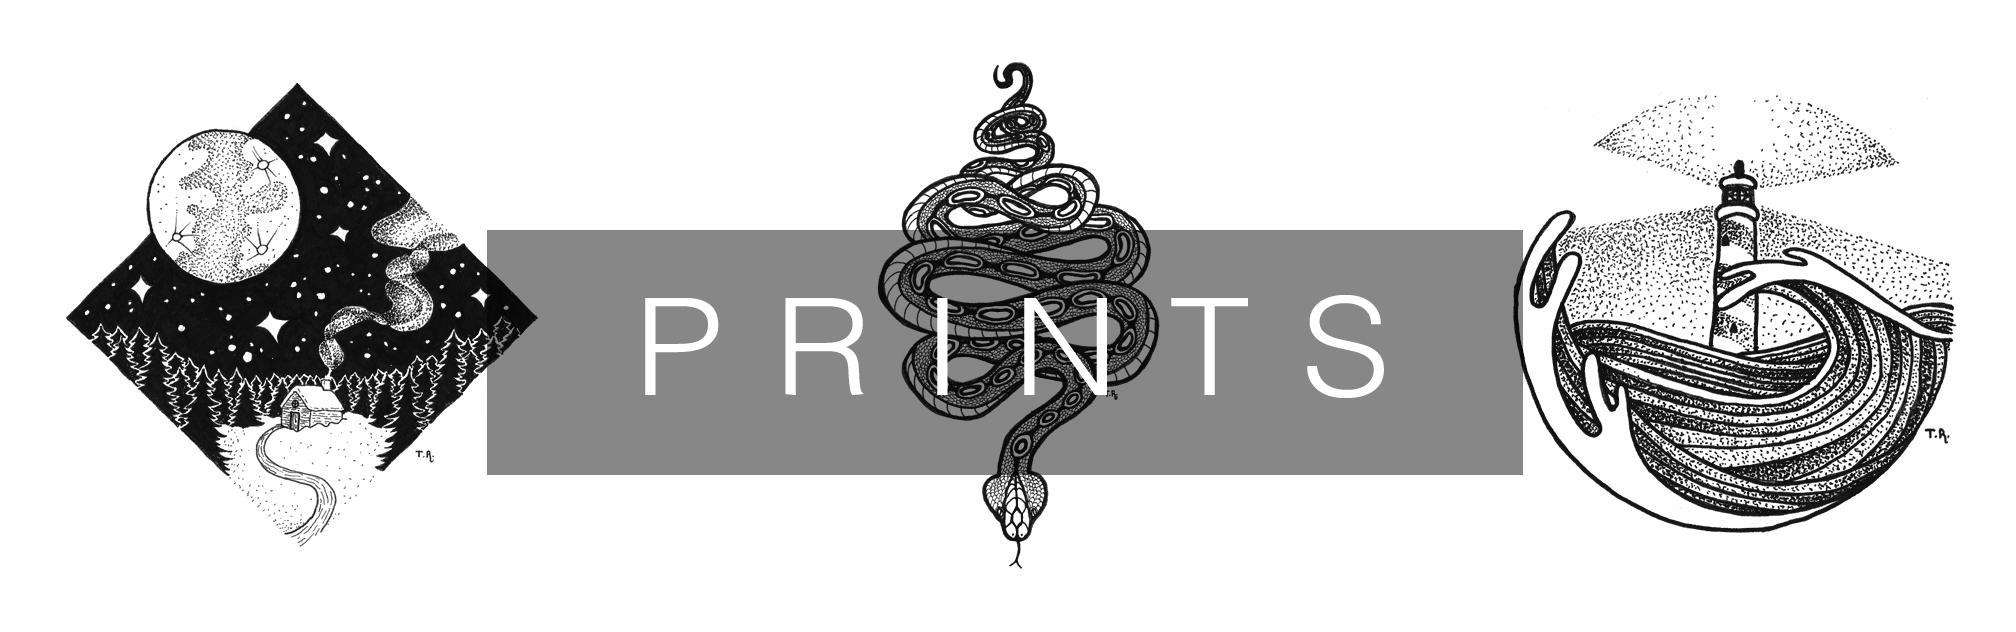 print slideshow4a.png